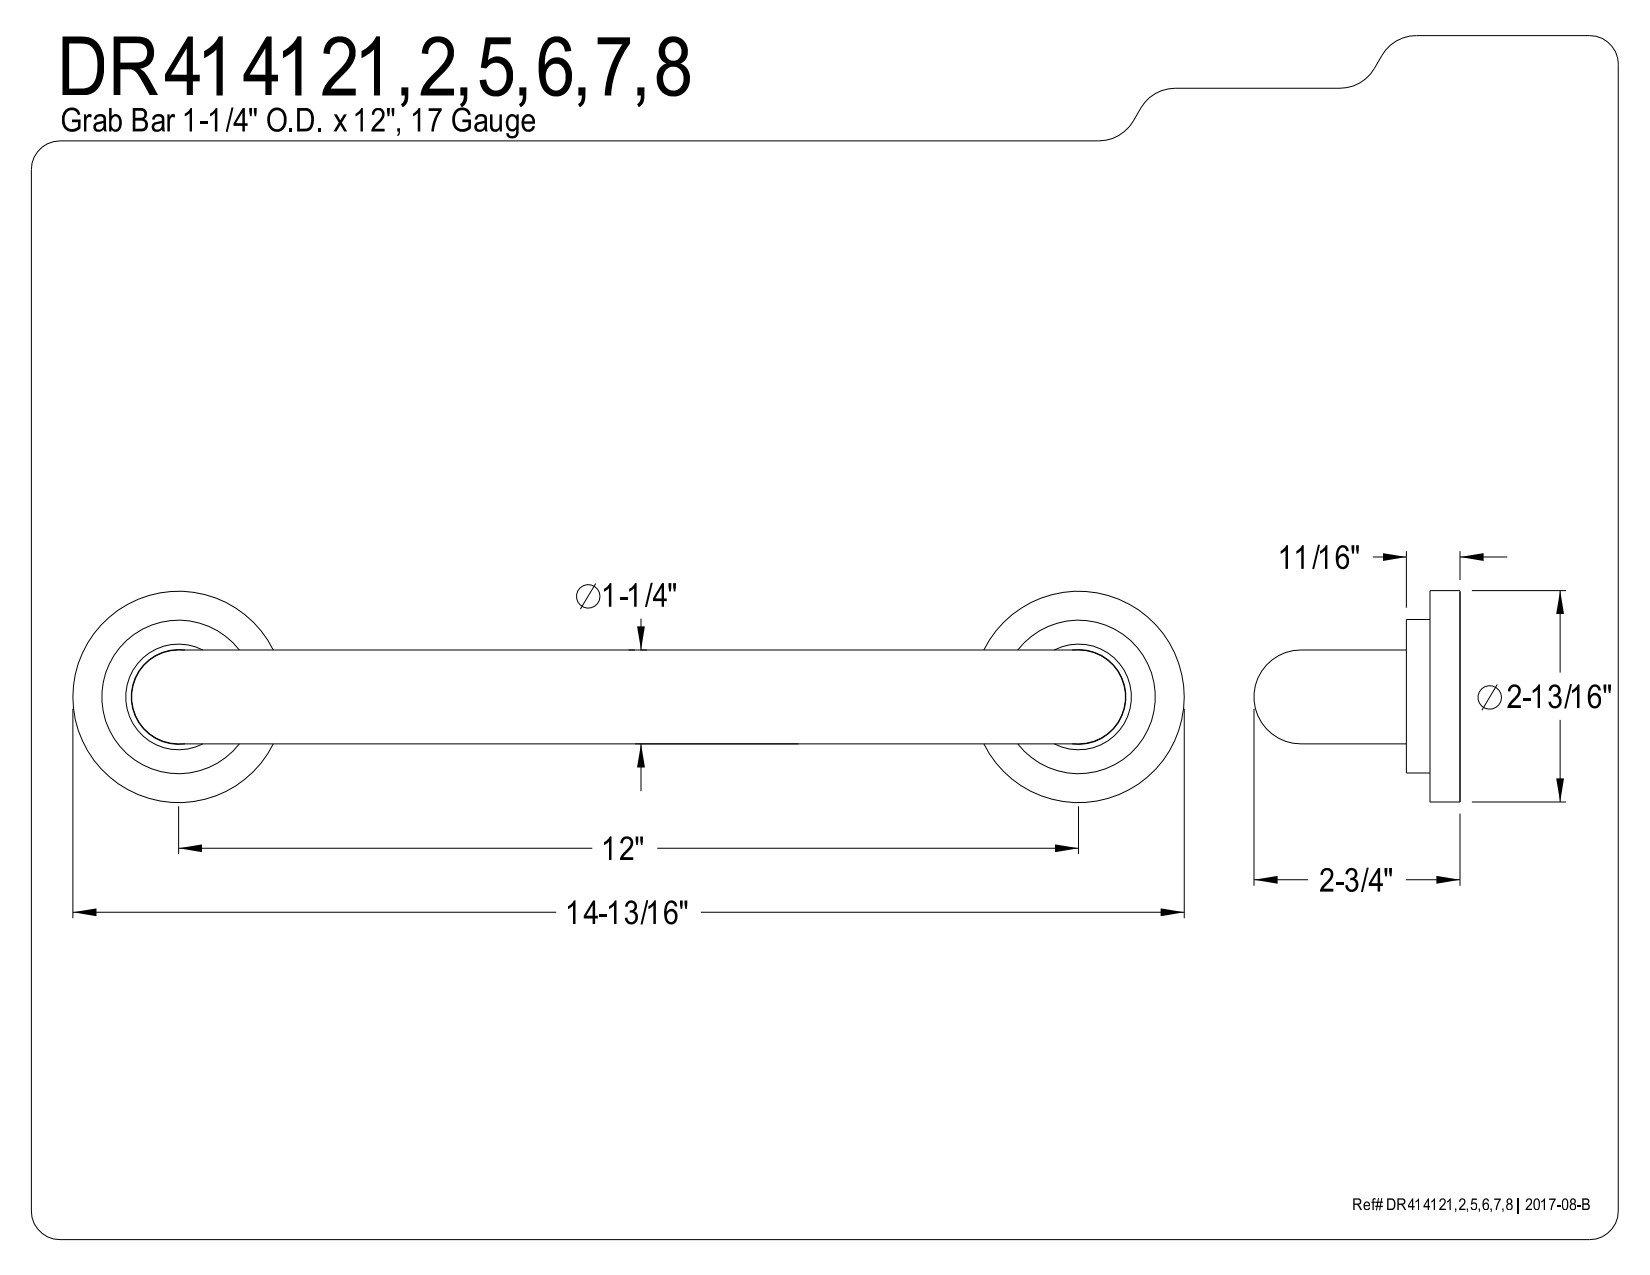 Kingston Brass DR414125 Designer Trimscape Manhattan Decor 12-Inch Grab Bar with 1.25-Inch Outer Diameter, Oil Rubbed Bronze